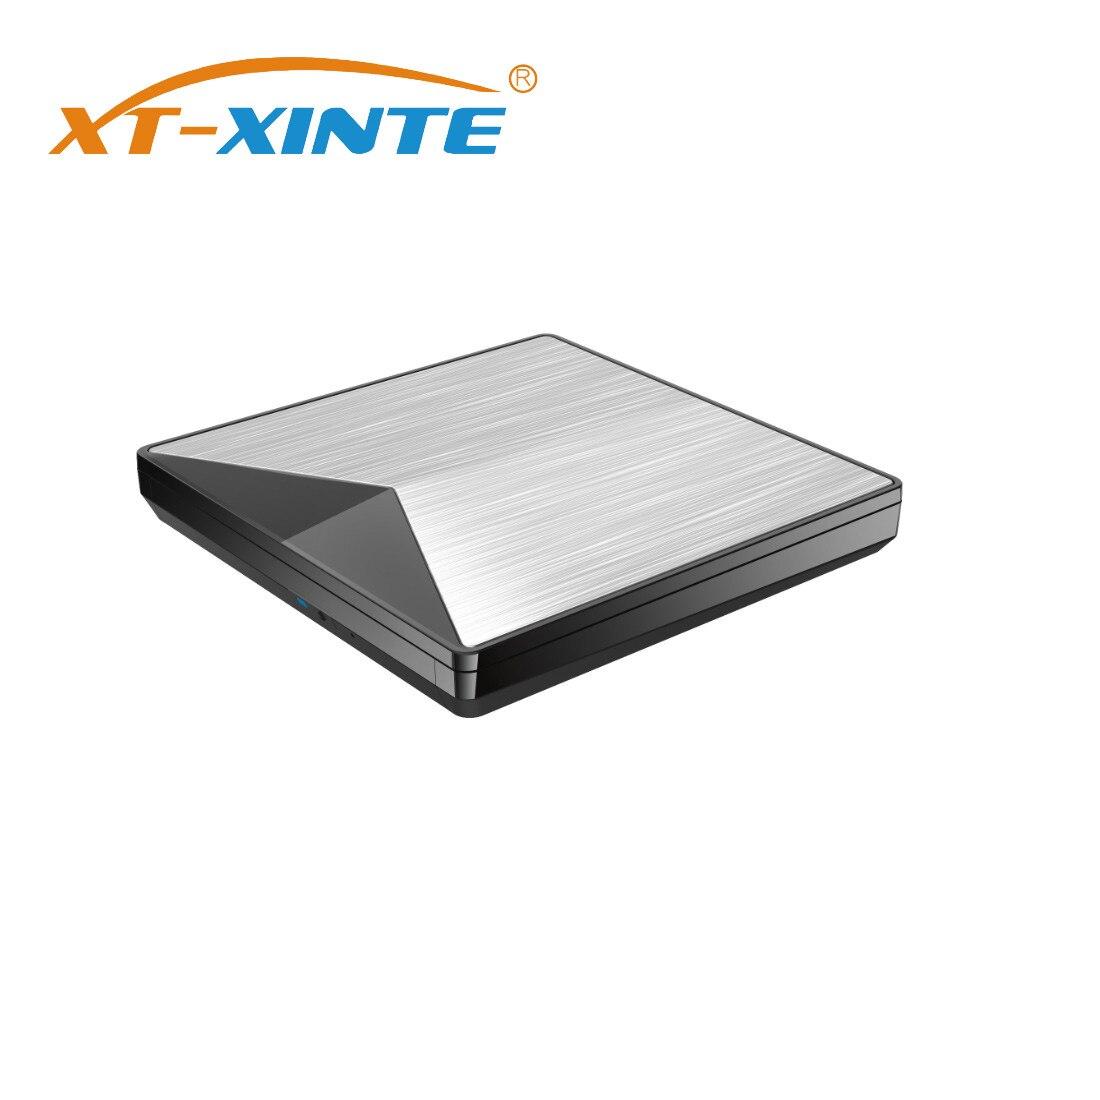 XT-XINTE USB 3,0 CD DVD Drive Externe DVD Optisches Laufwerk für Laptop Desktop Tragbare Schlank CD DVD RW Brenner Player schriftsteller Reader